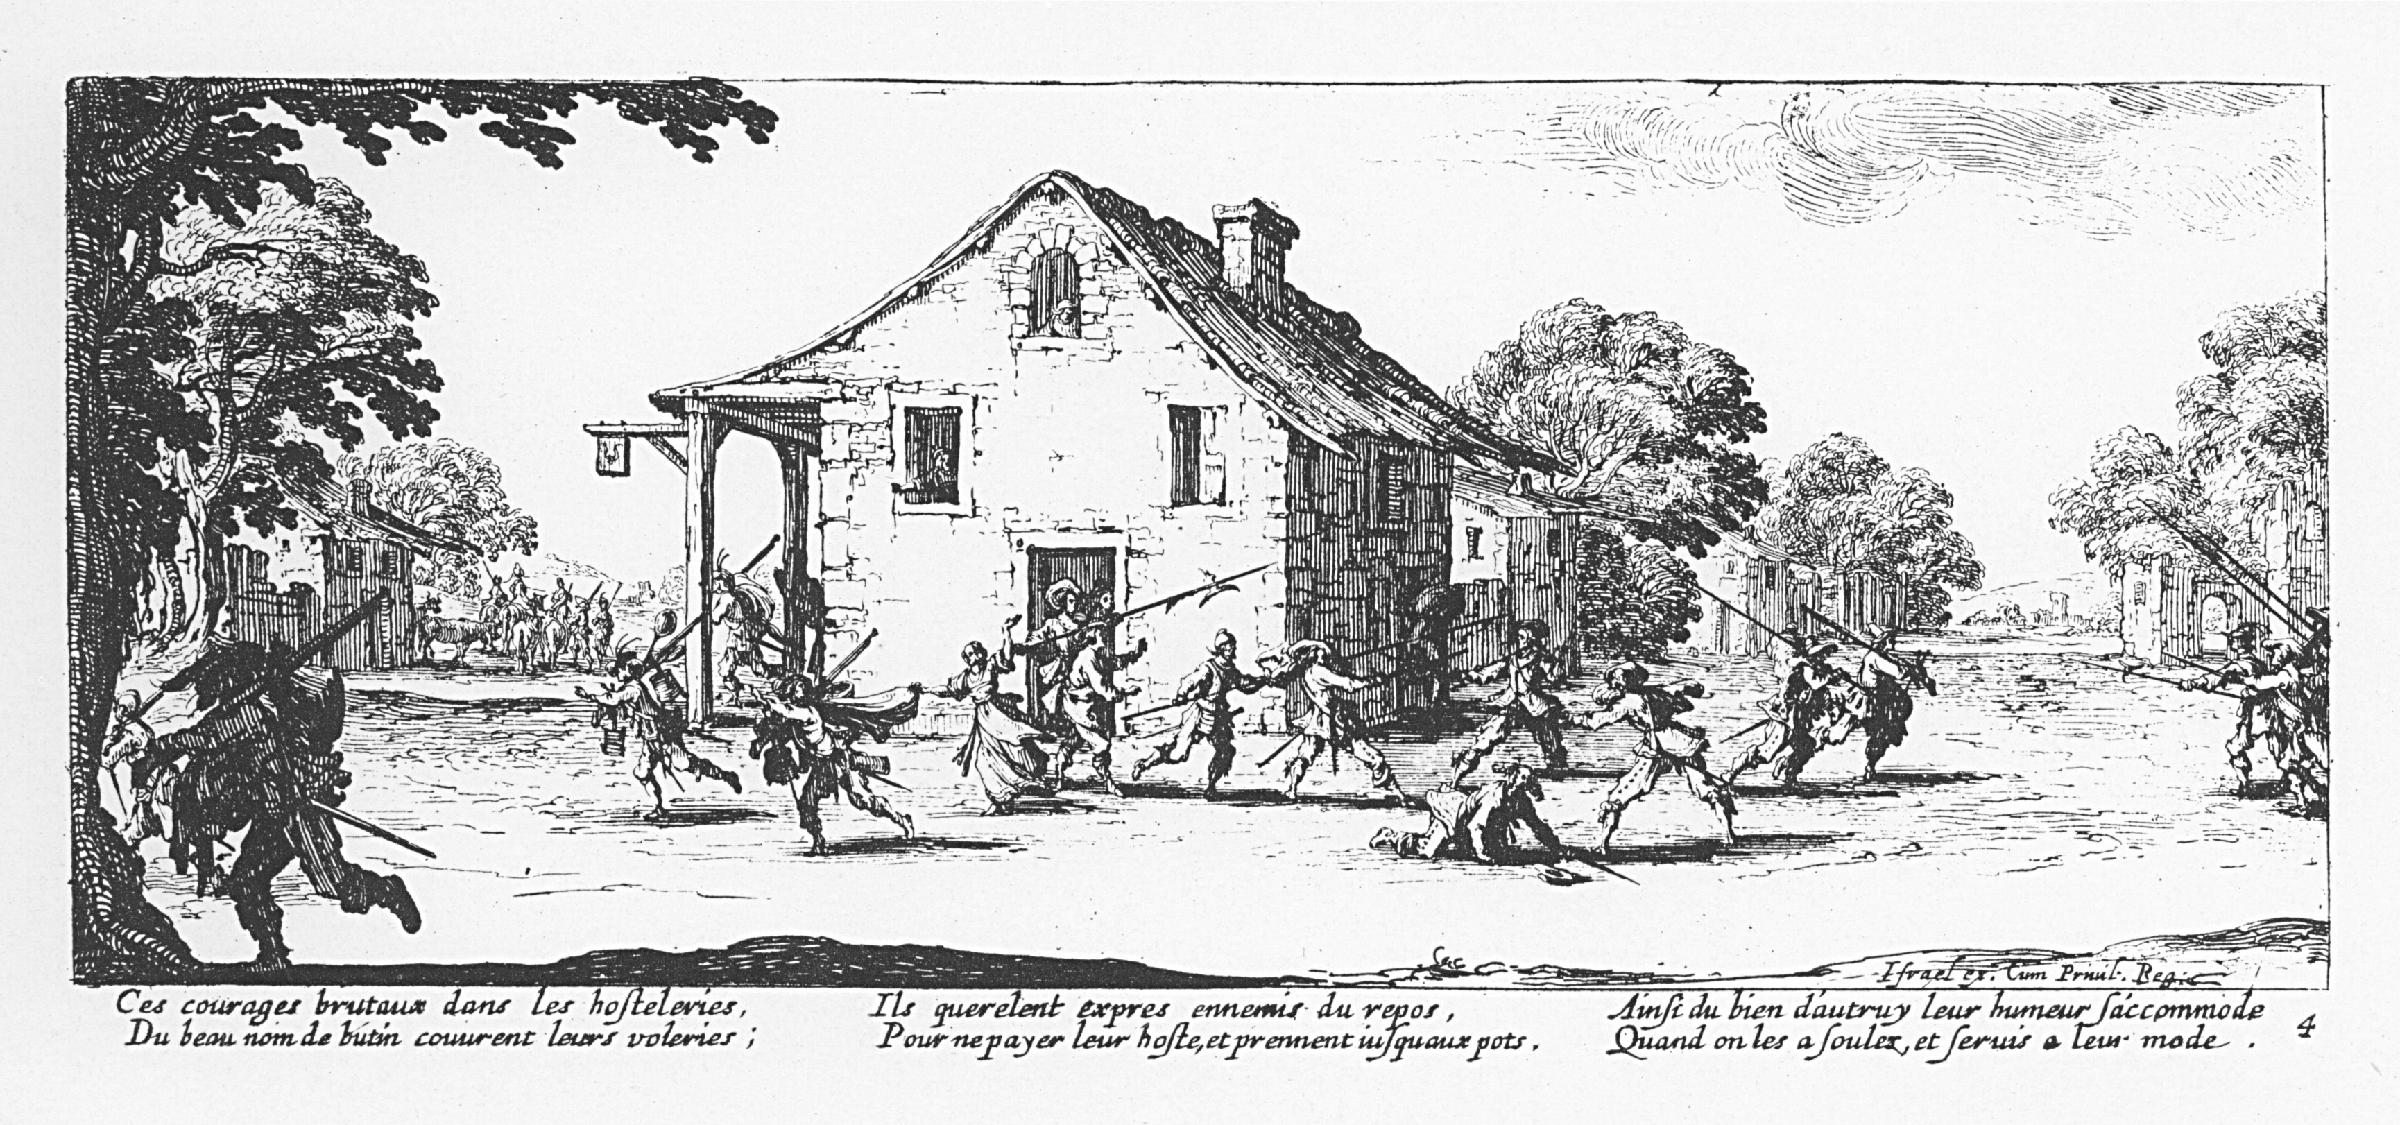 La maraude.Sumber gambar: wikimedia.org